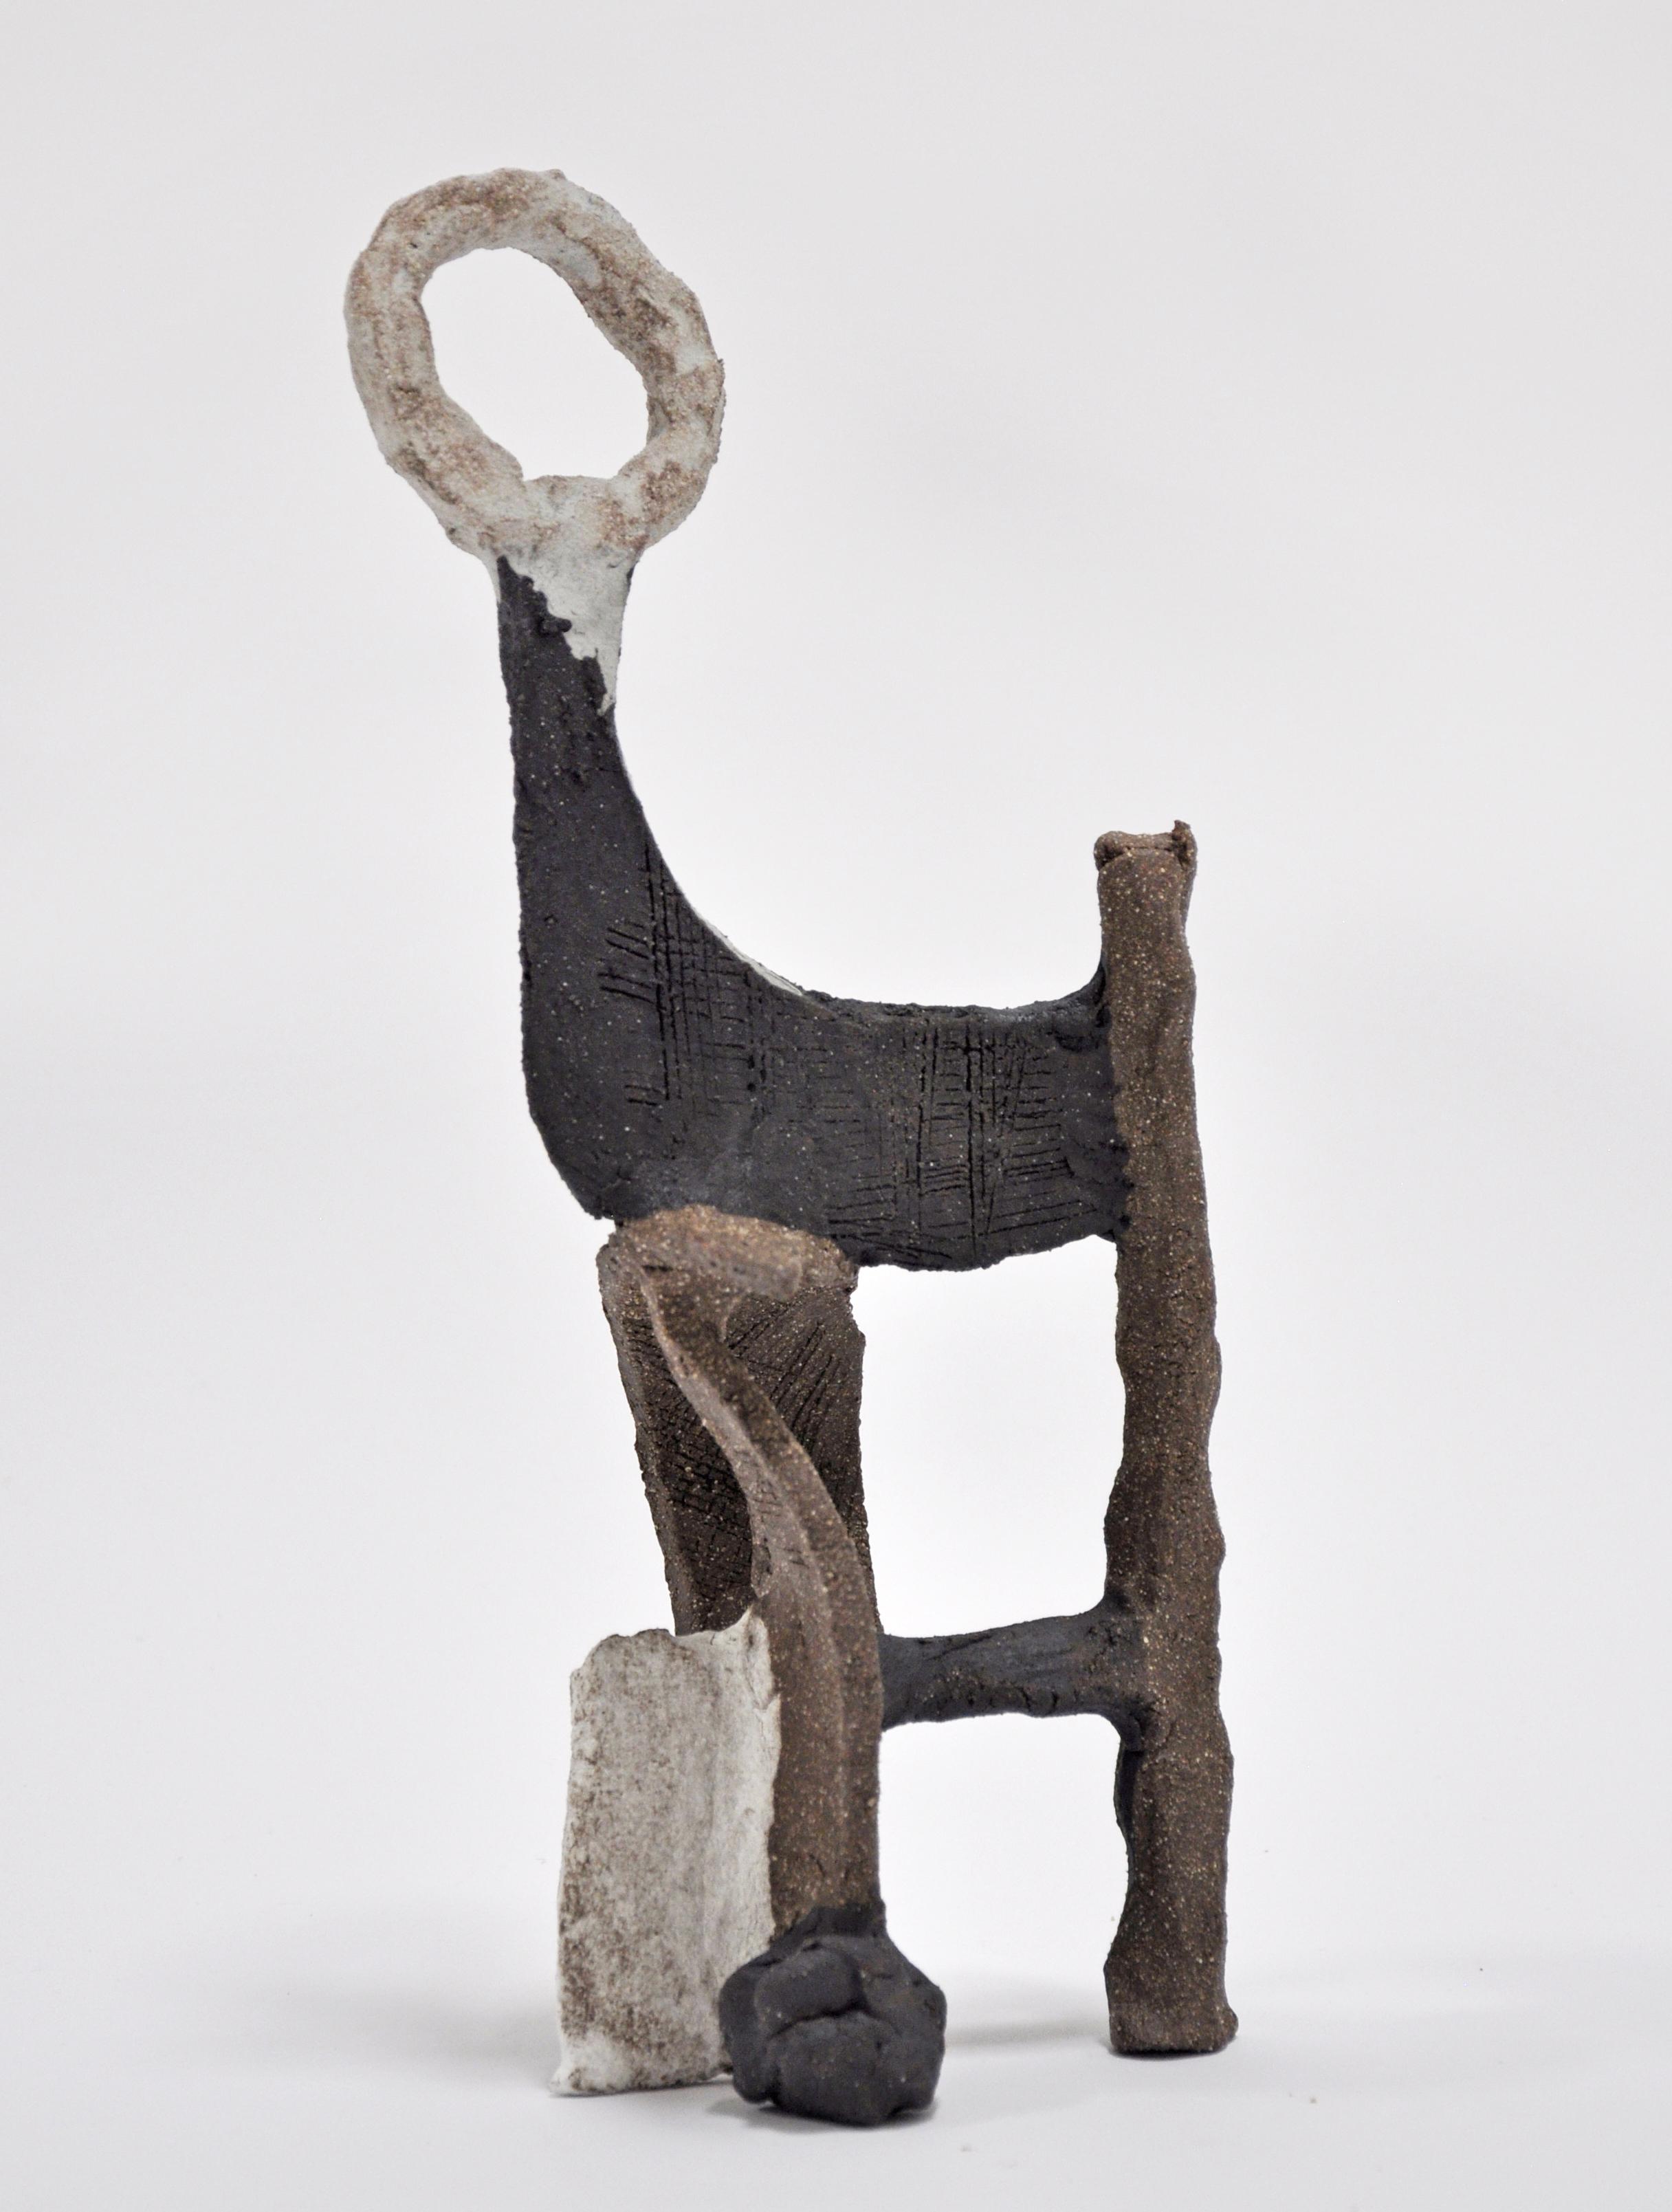 Nick Makanna. Rune Study IX, 13 x 5 x 6 in, Glazed ceramic, 2019